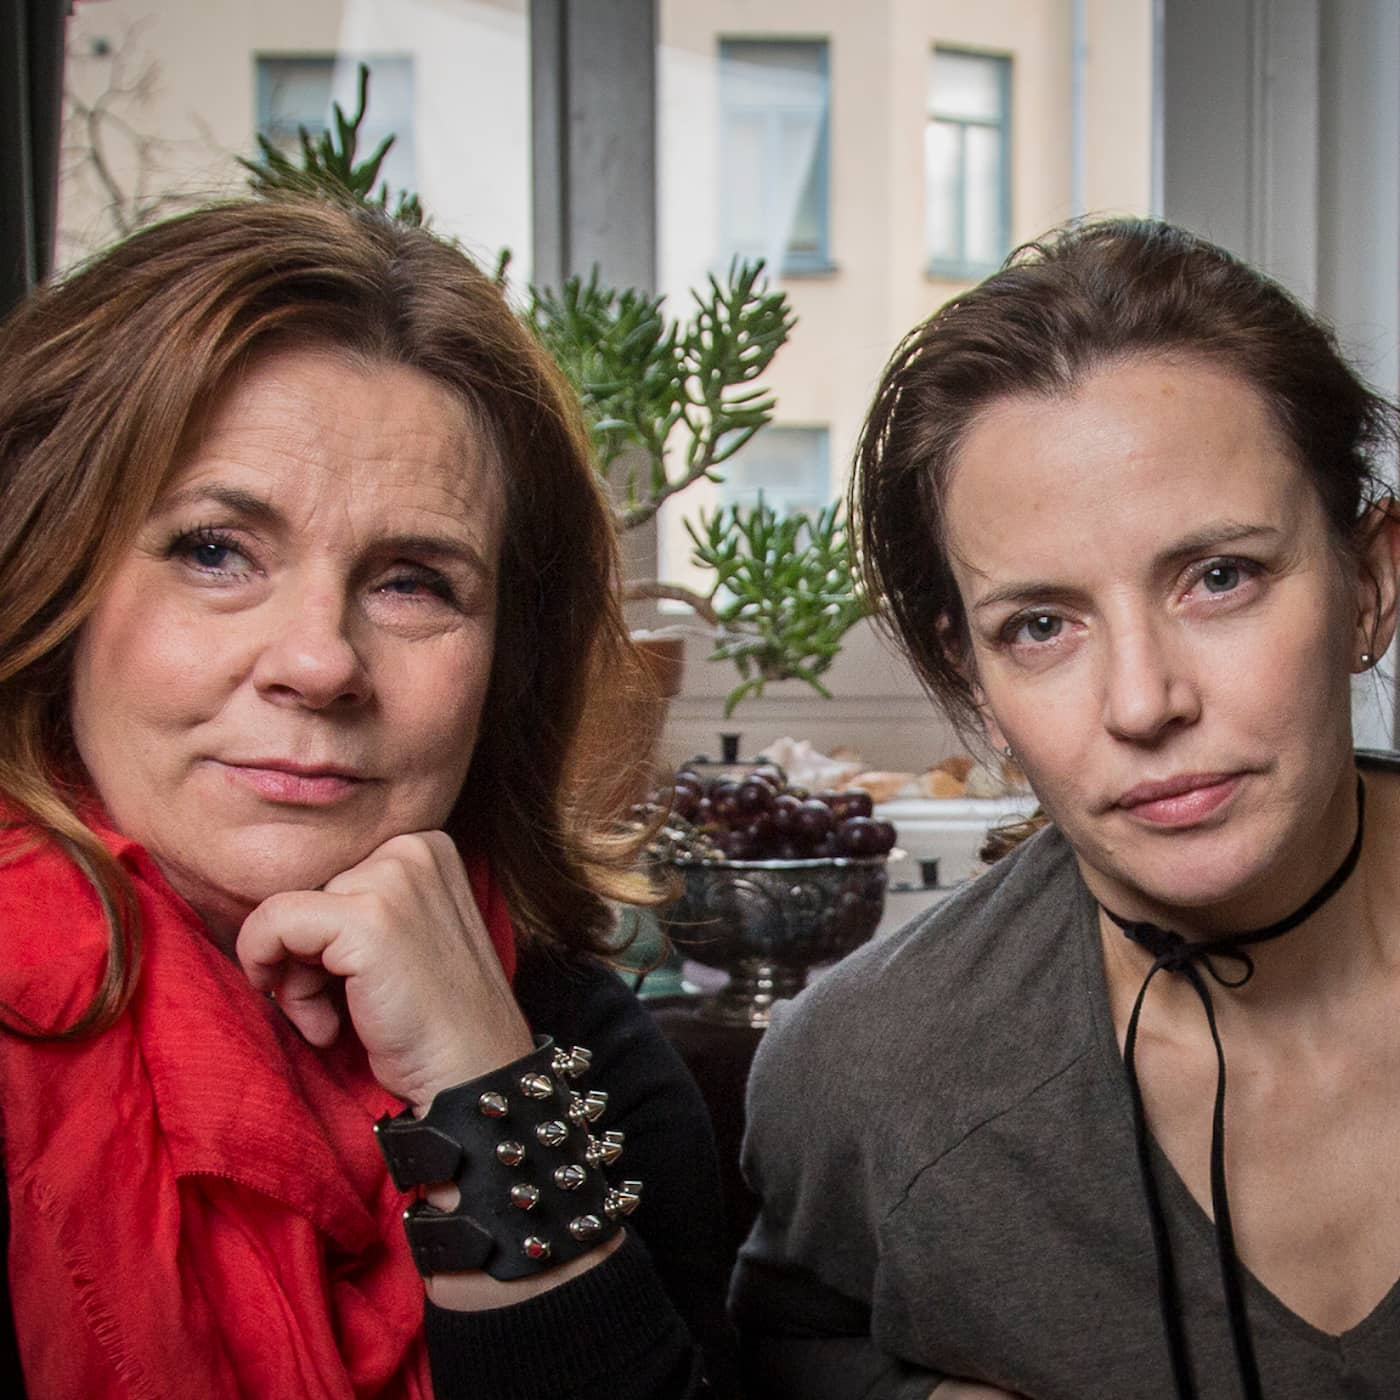 Amanda Ooms katarina hahr möter skådespelerskan amanda ooms